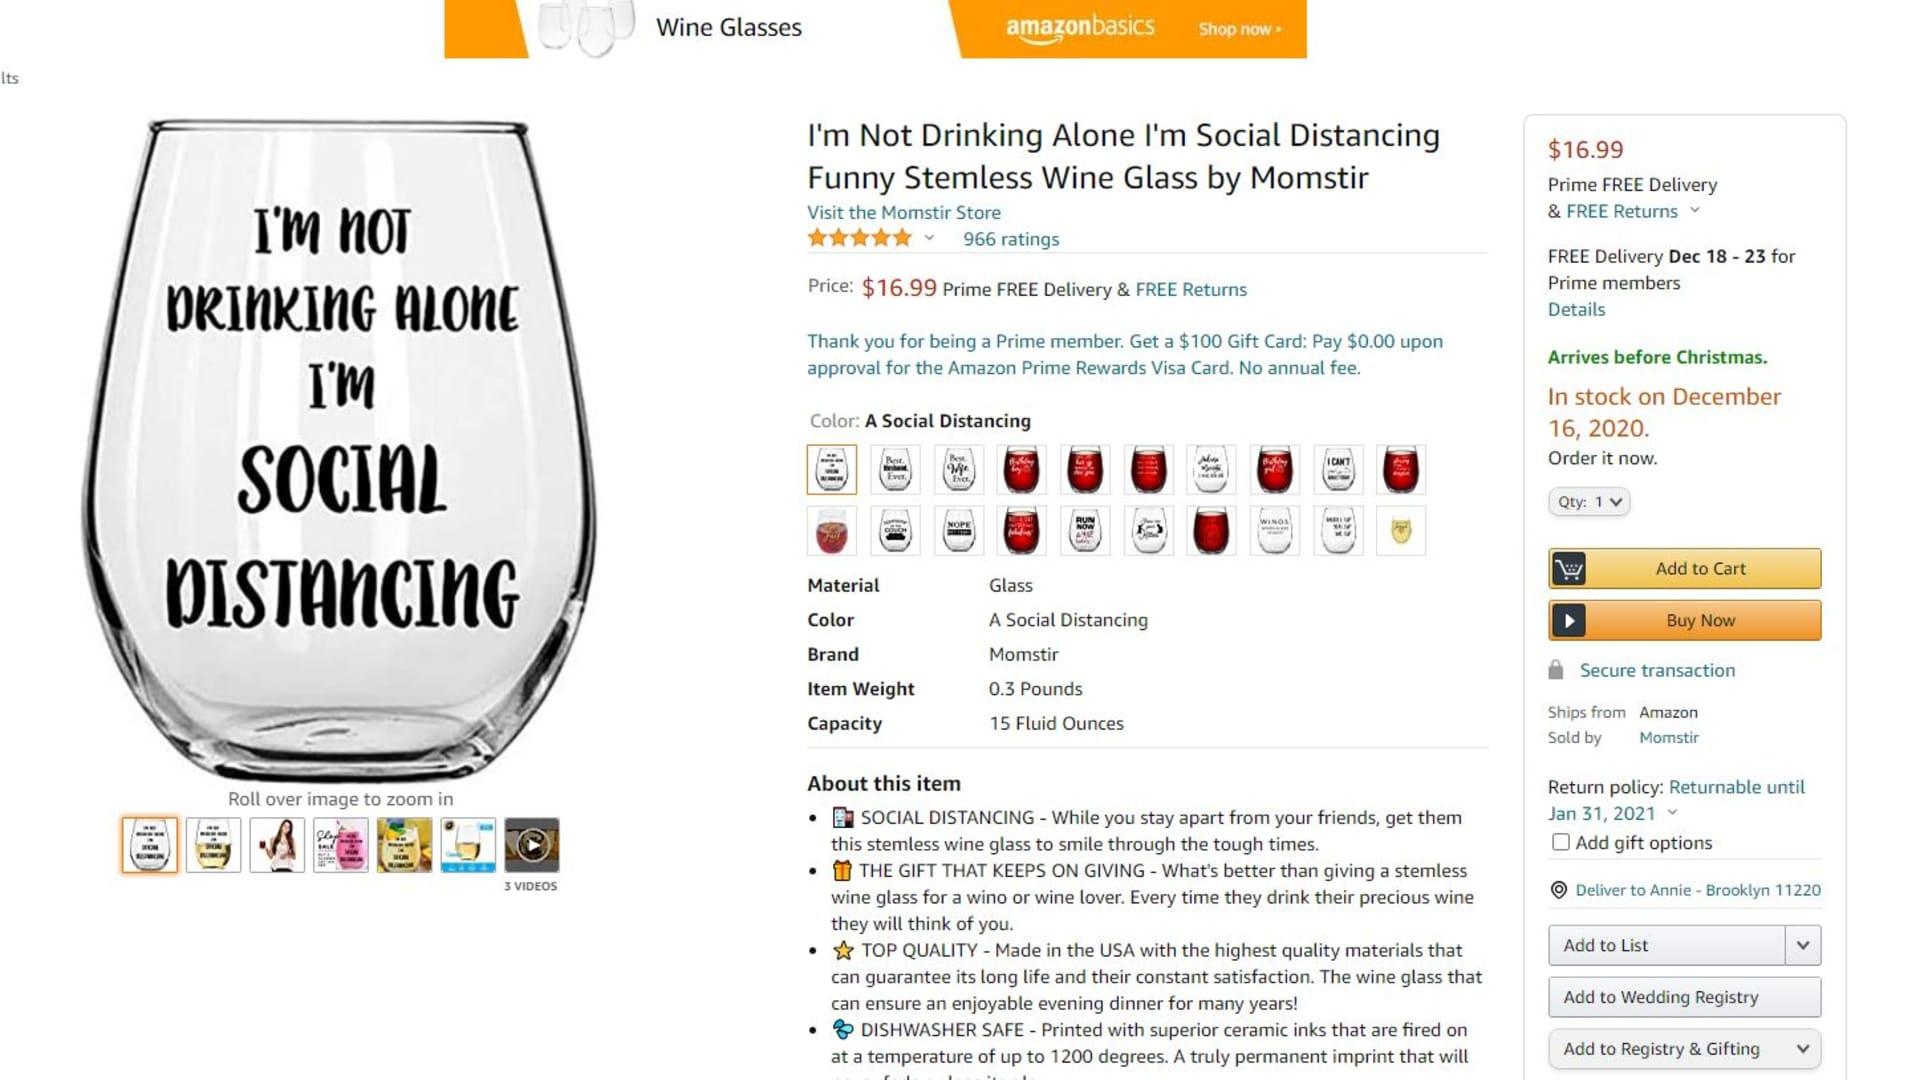 One of Momstir's top-selling wine glasses won't be in stock until next week.